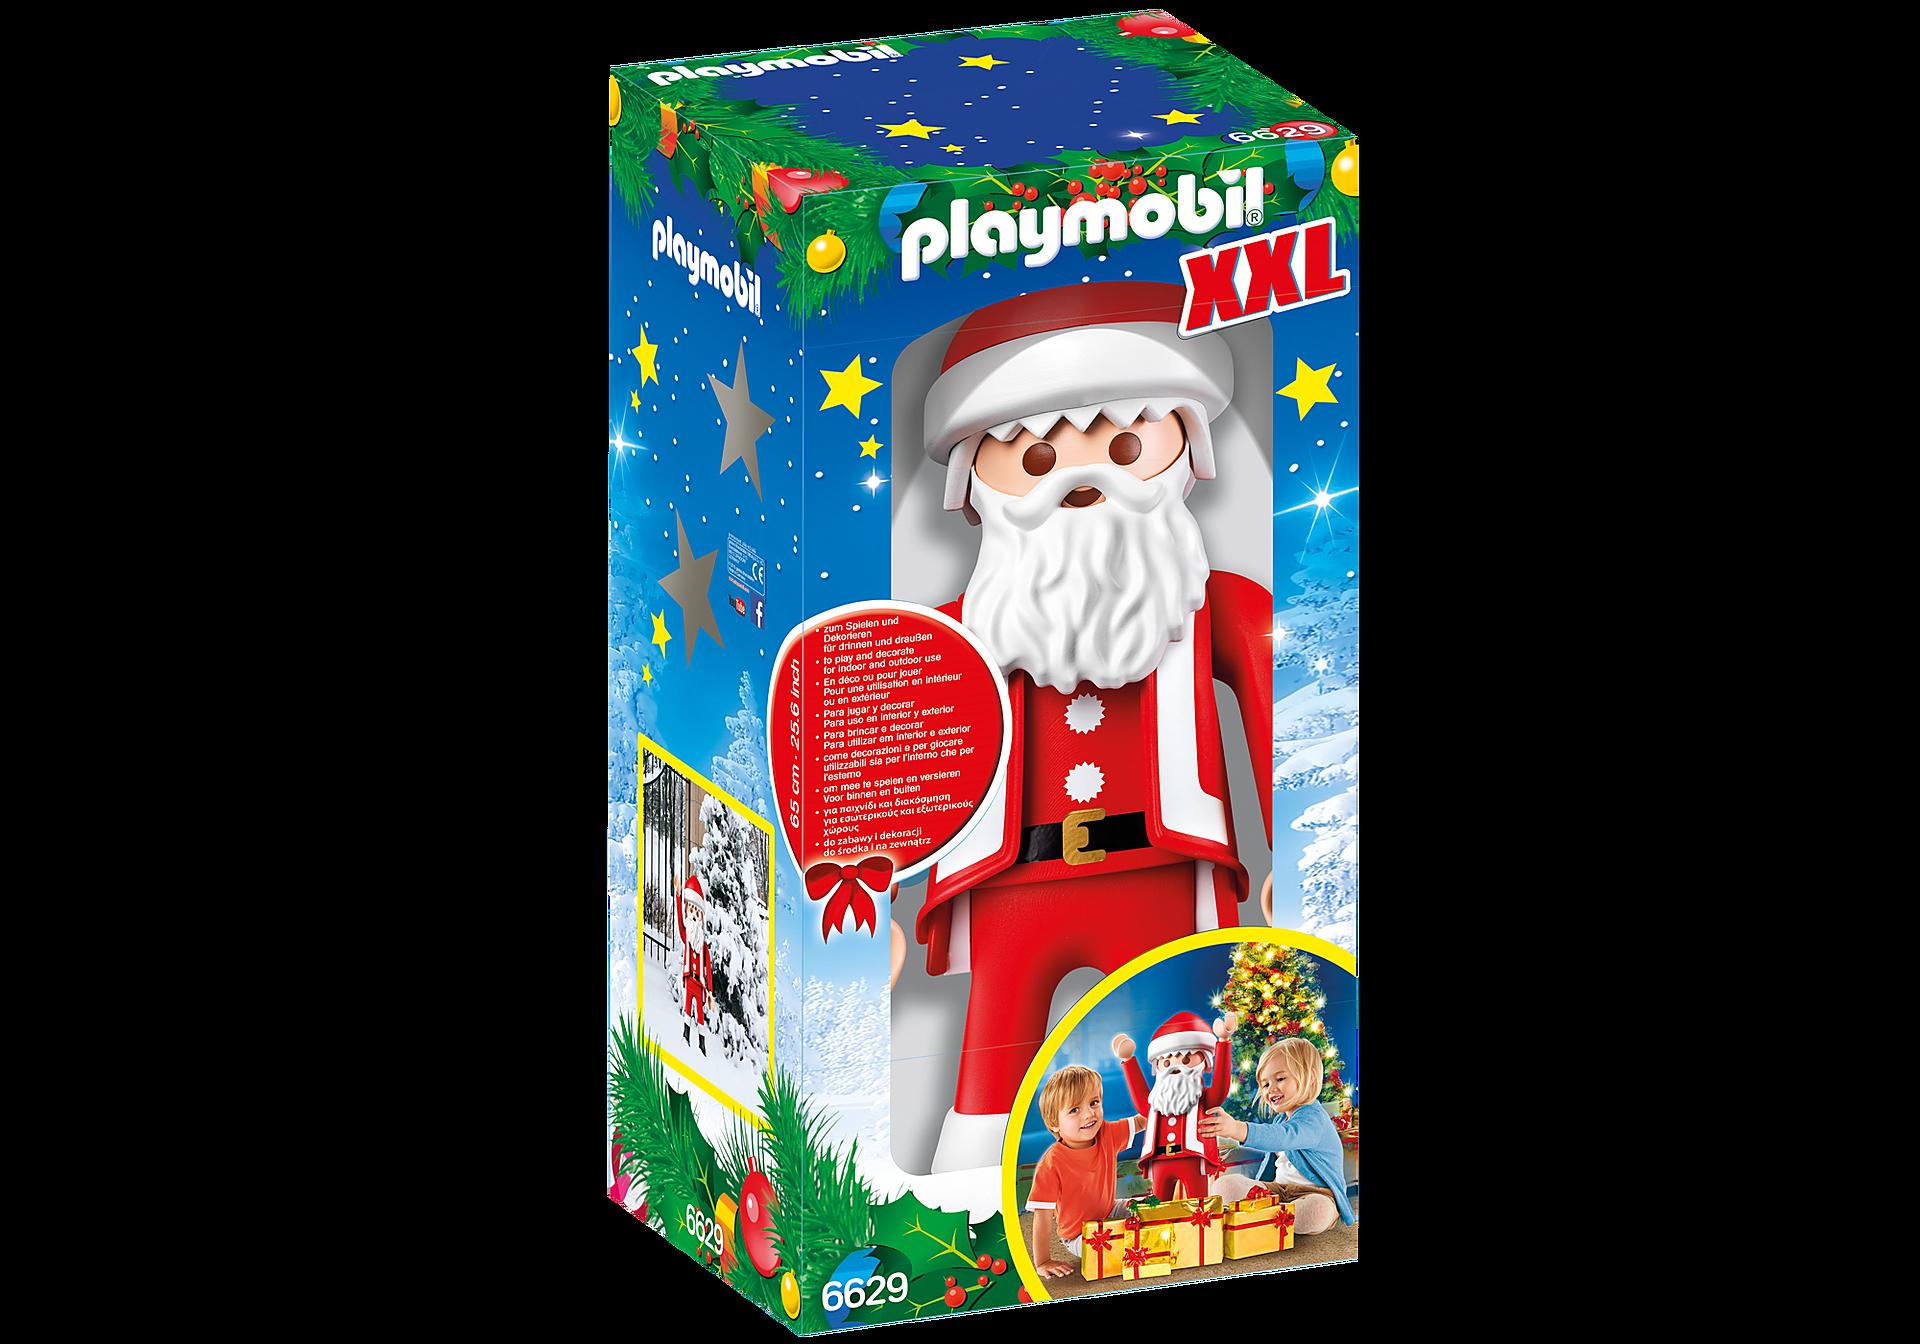 6629 PLAYMOBIL XXL Santa Claus zoom image2